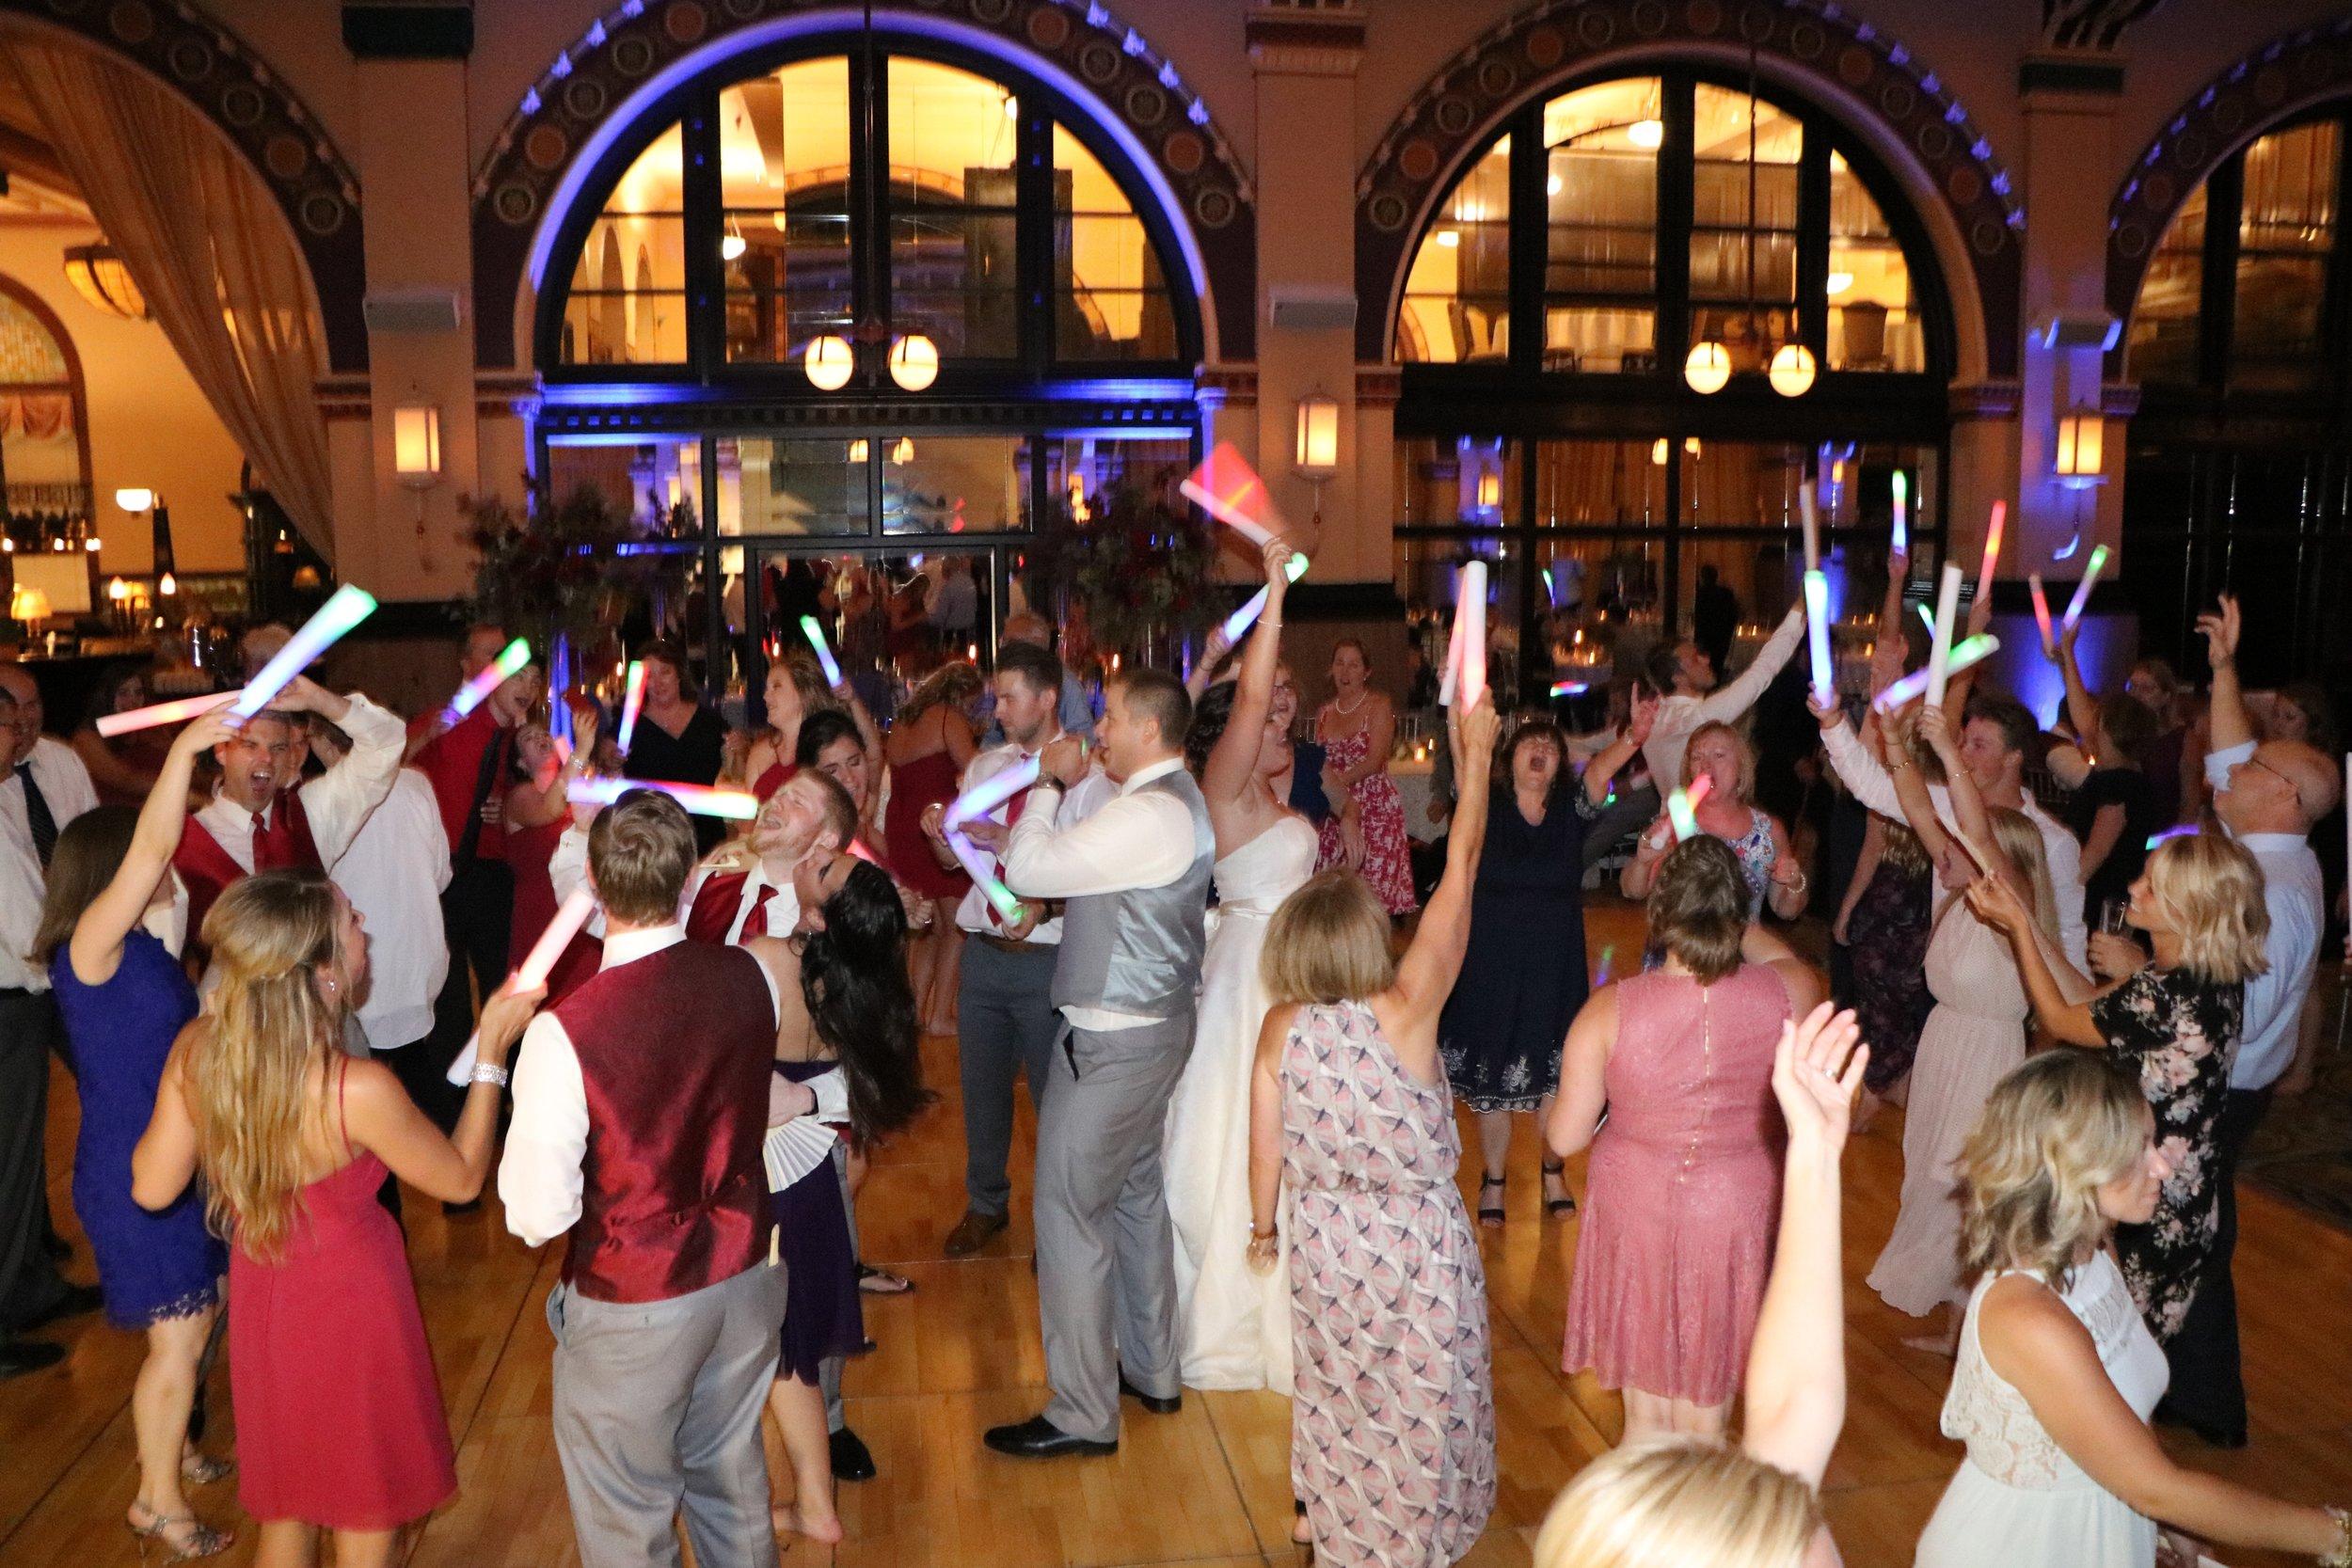 Diana & Nick led the fun on the dance floor all night!